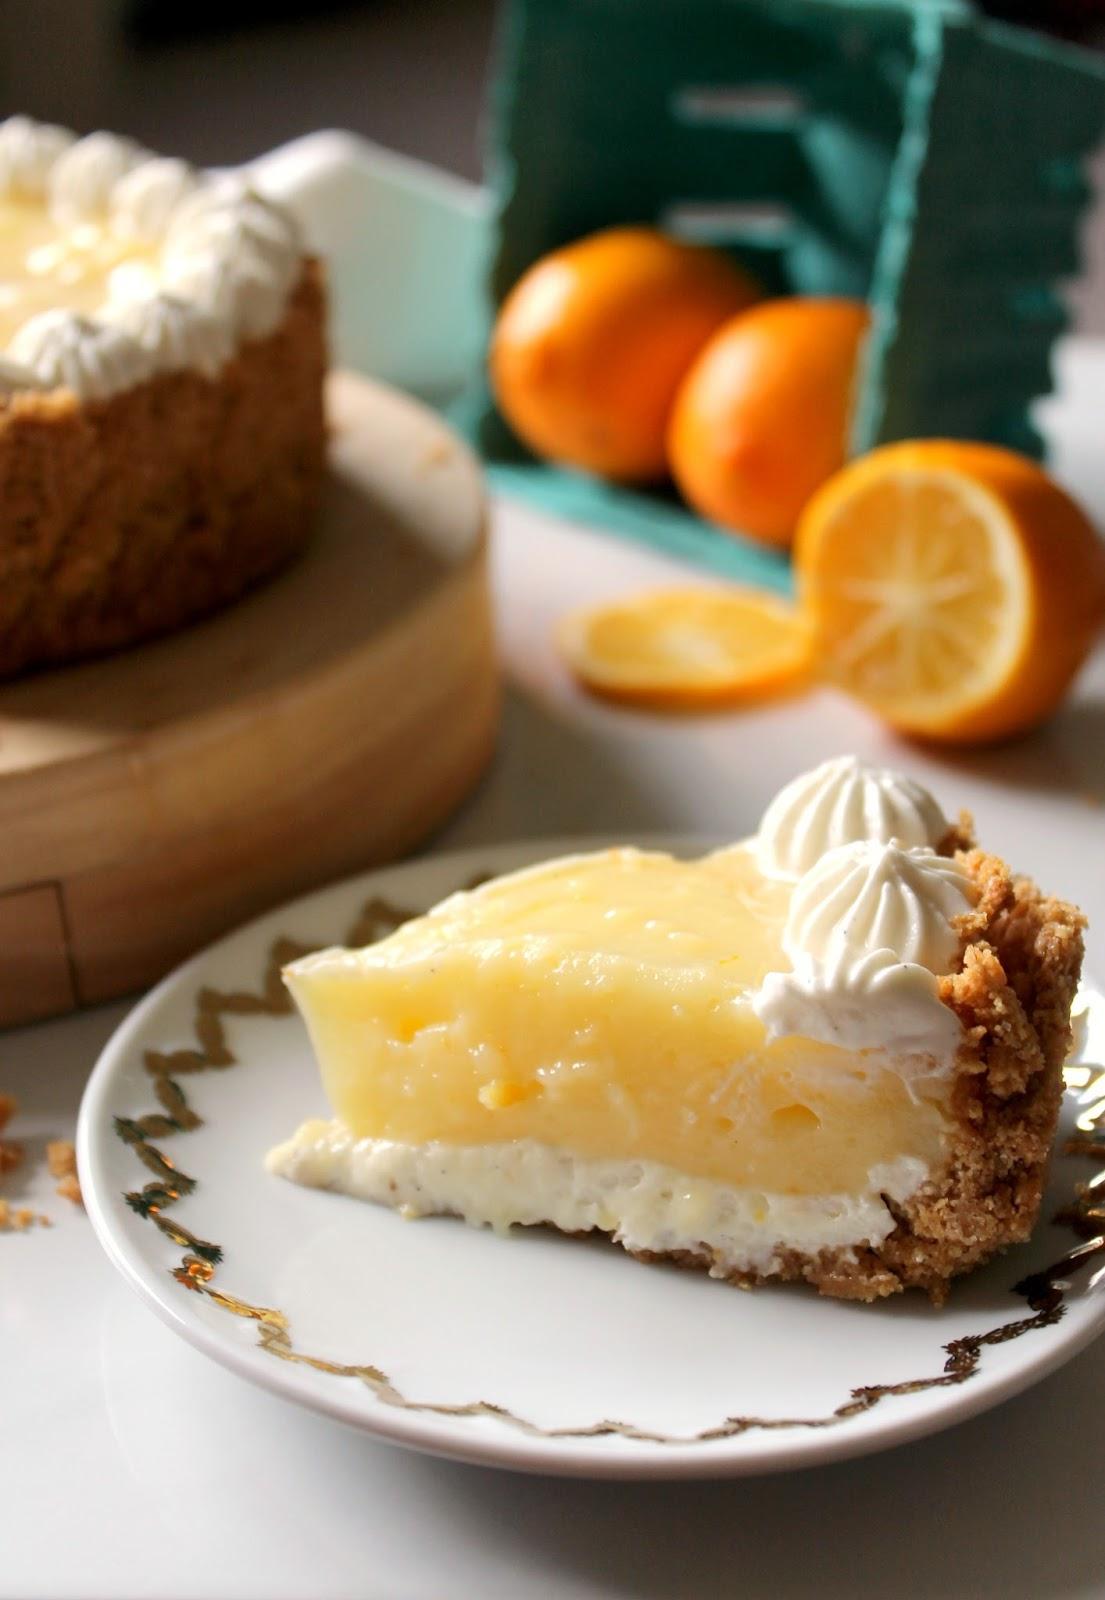 Meyer Lemon + Yogurt Cream Pie - The Kitchen Prep Blog